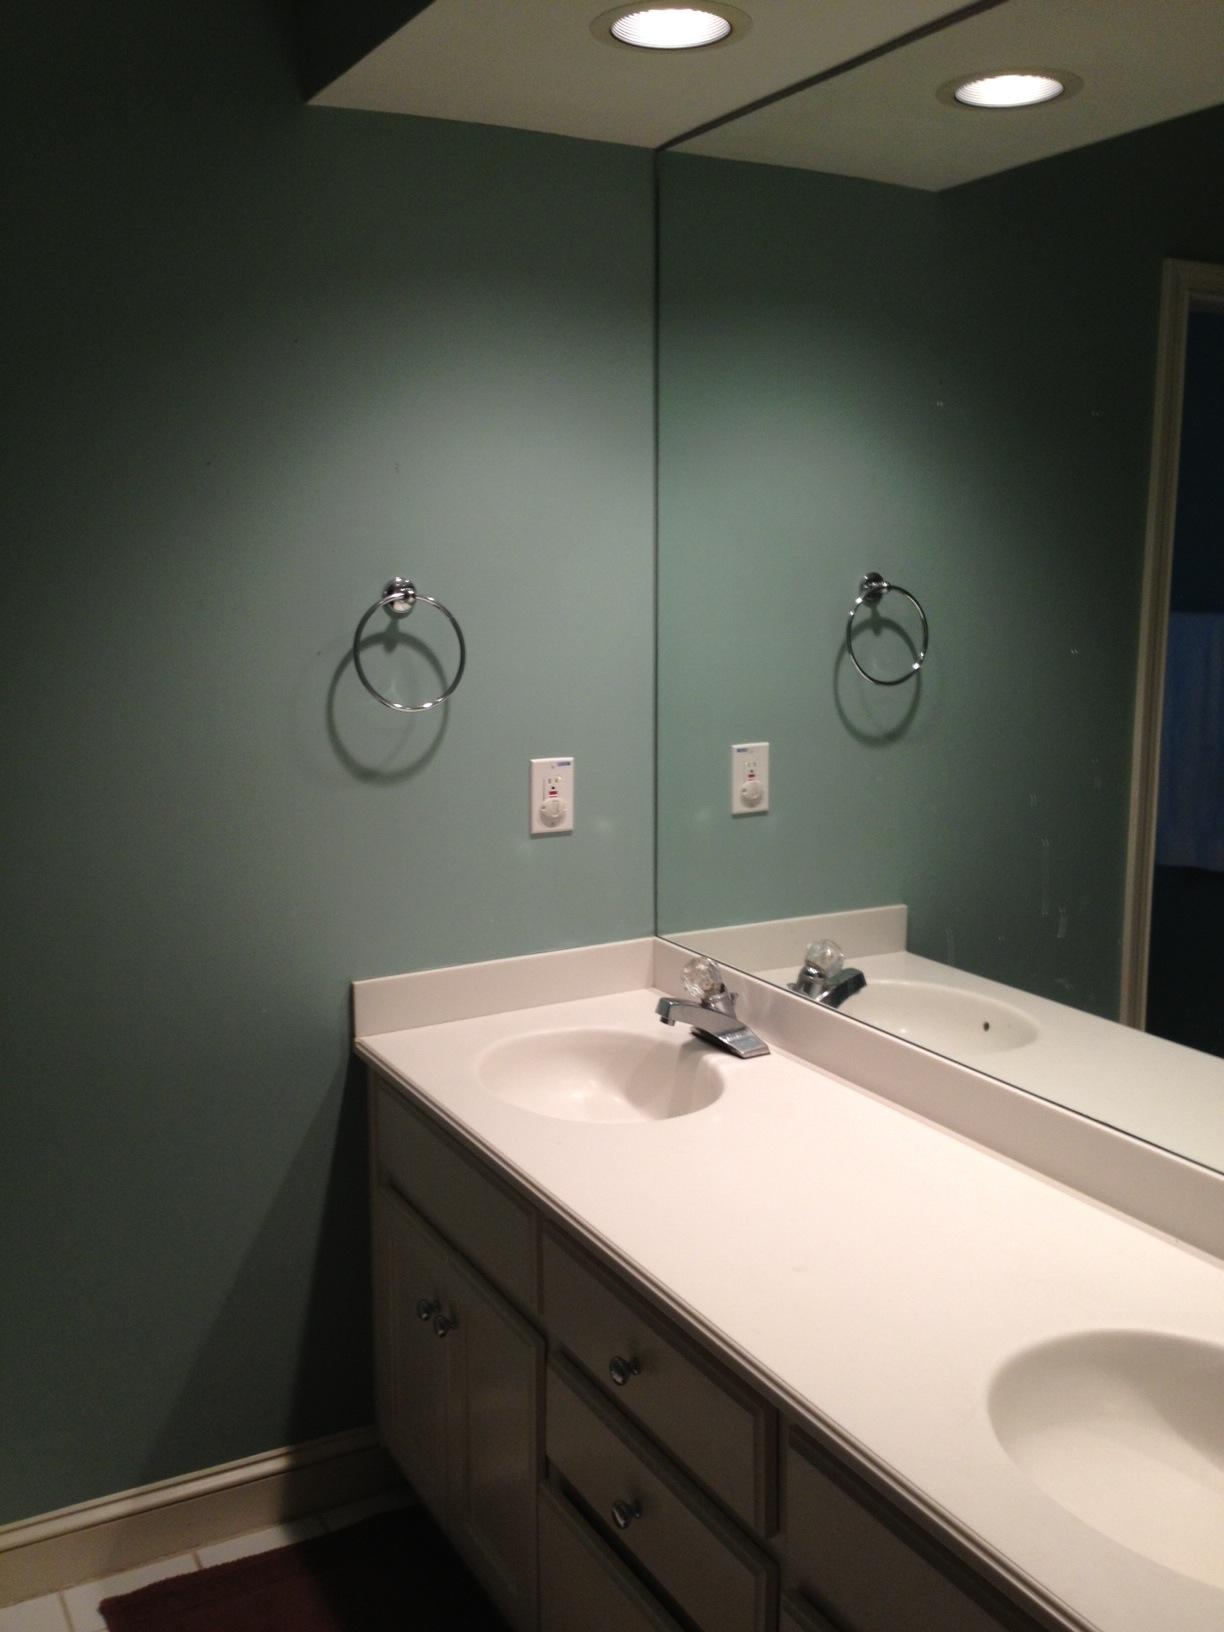 Renovation Calliespondence - Tom drexler bathroom remodel